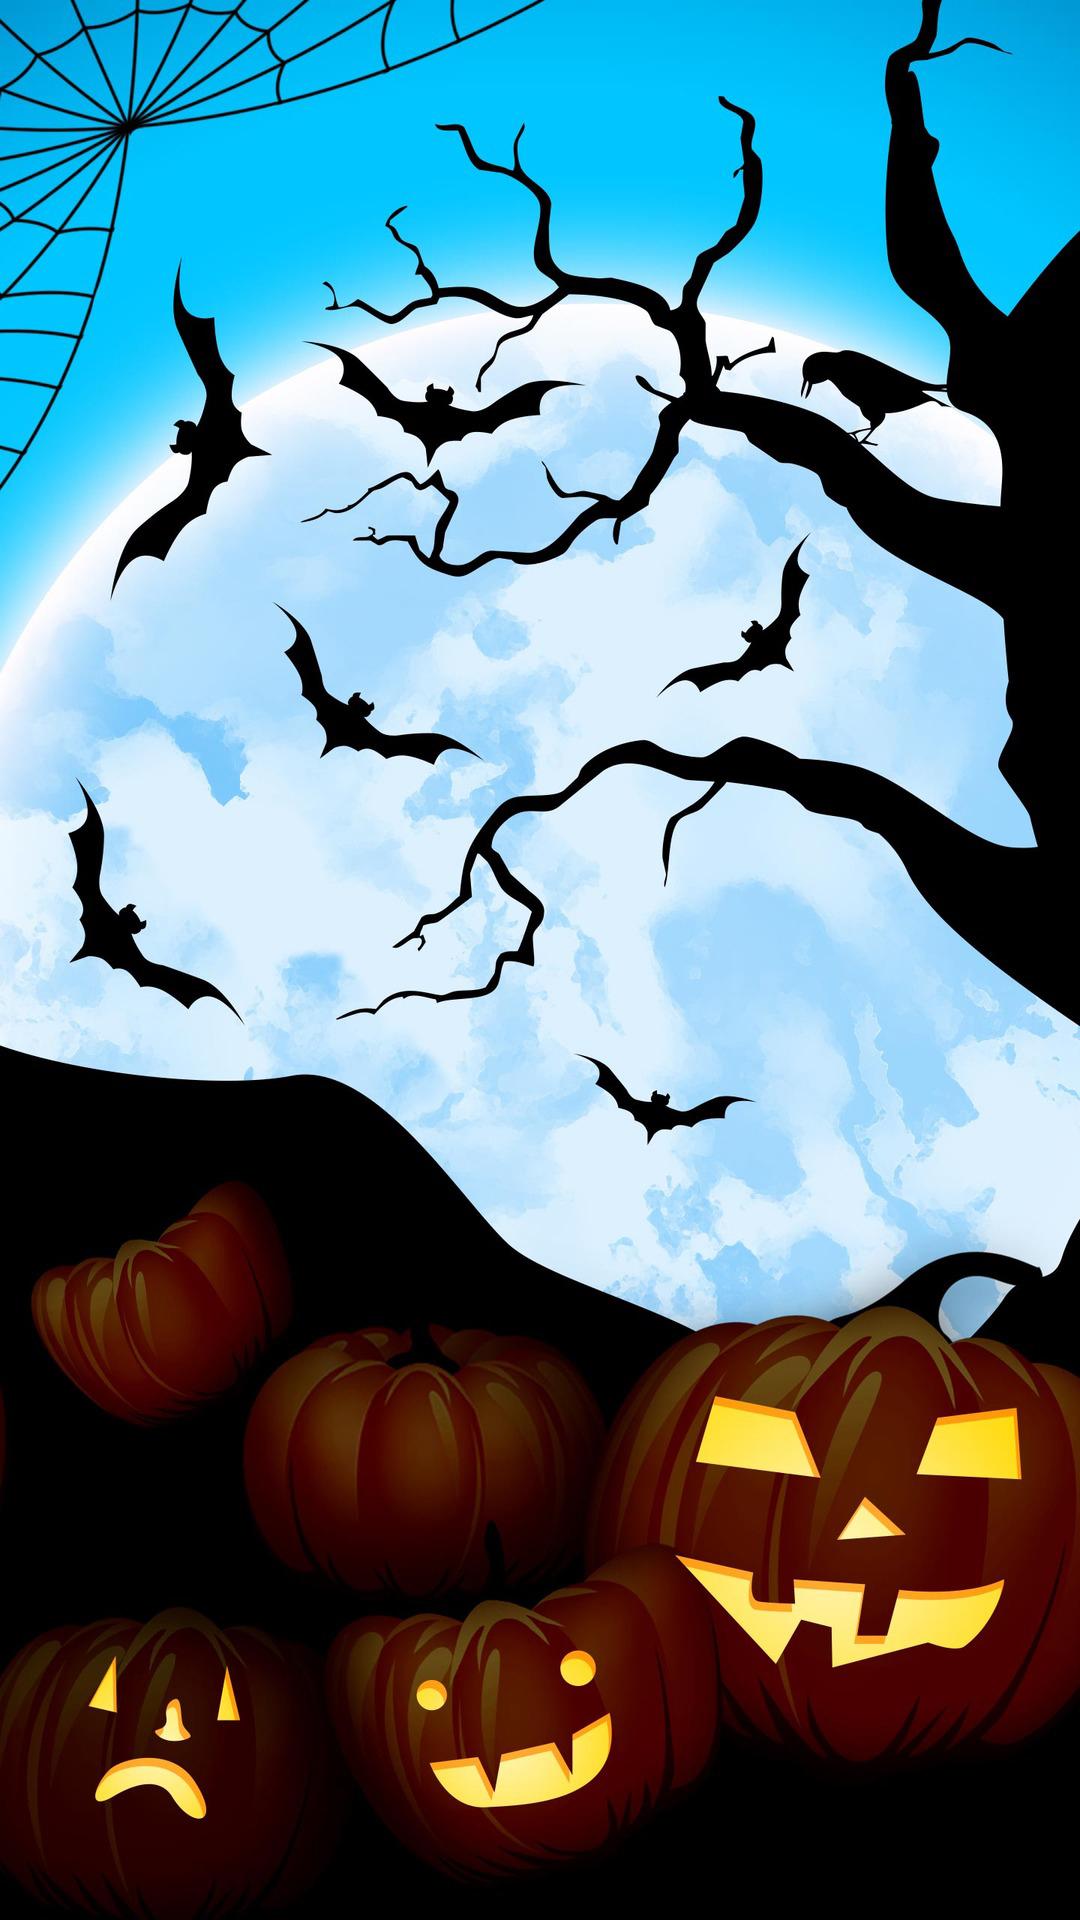 fondos halloween wallpapers gratis - photo #4